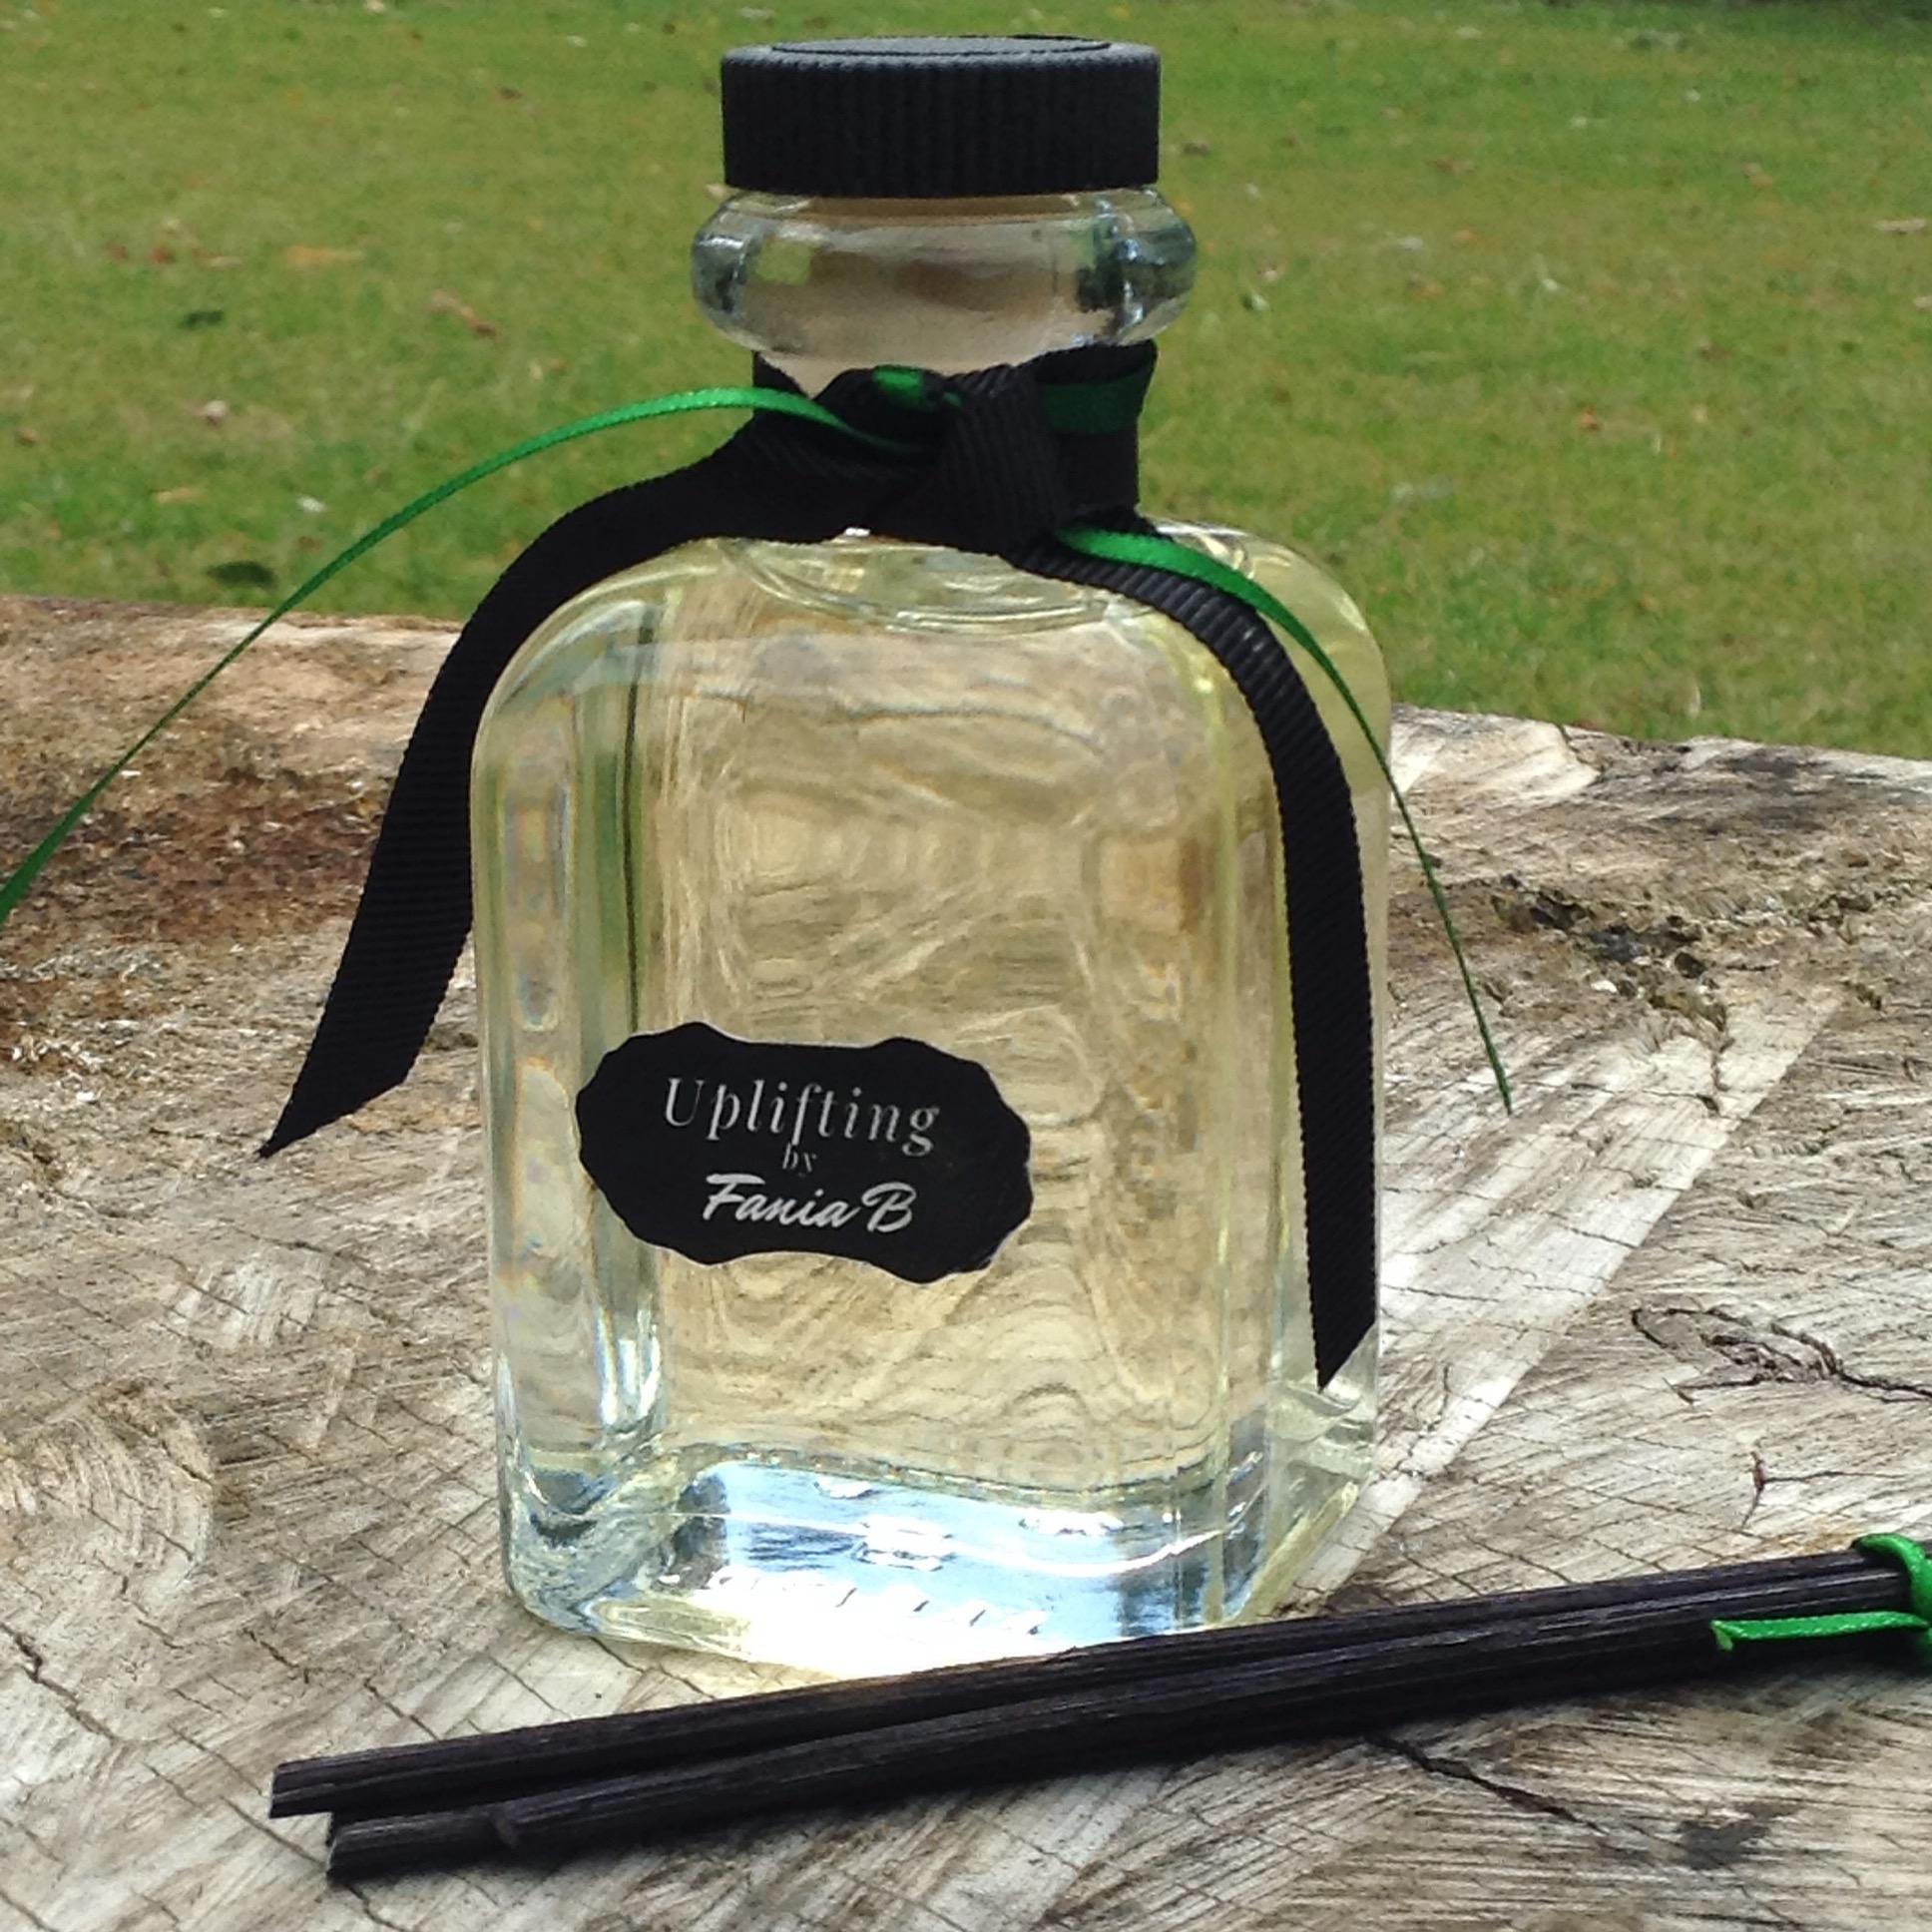 Uplifting home fragrance